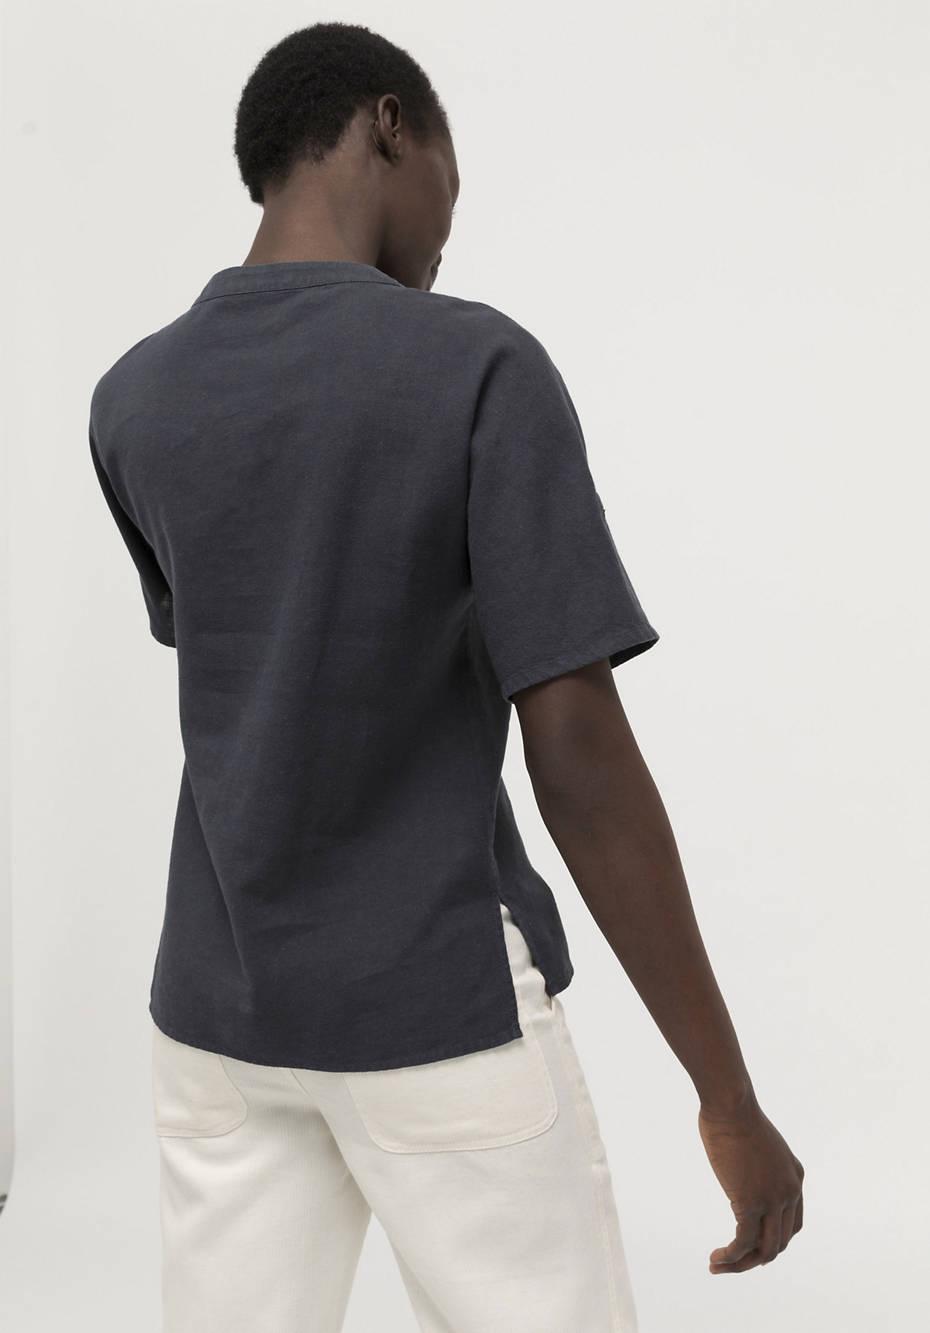 Blouse shirt made of hemp with organic cotton